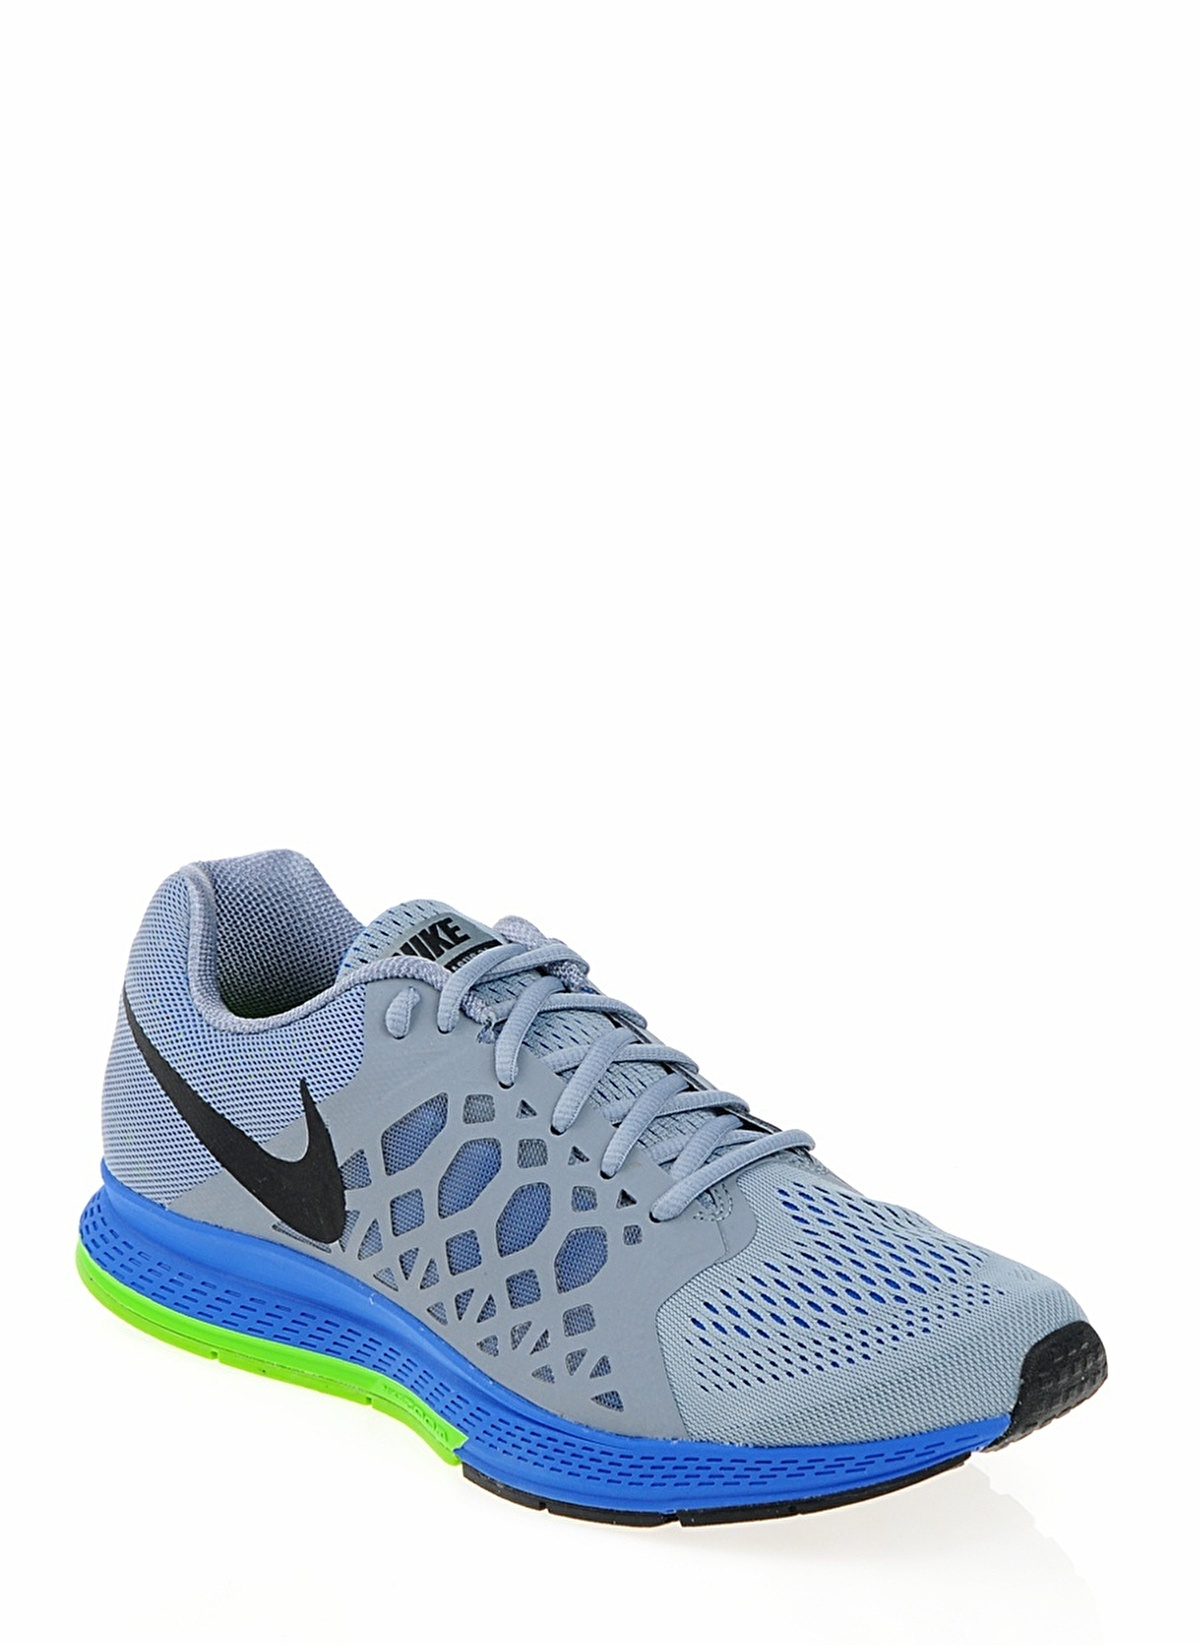 grande vente 55ad2 ece80 652925-003-Nike-Air-Zoom-Pegasus-31